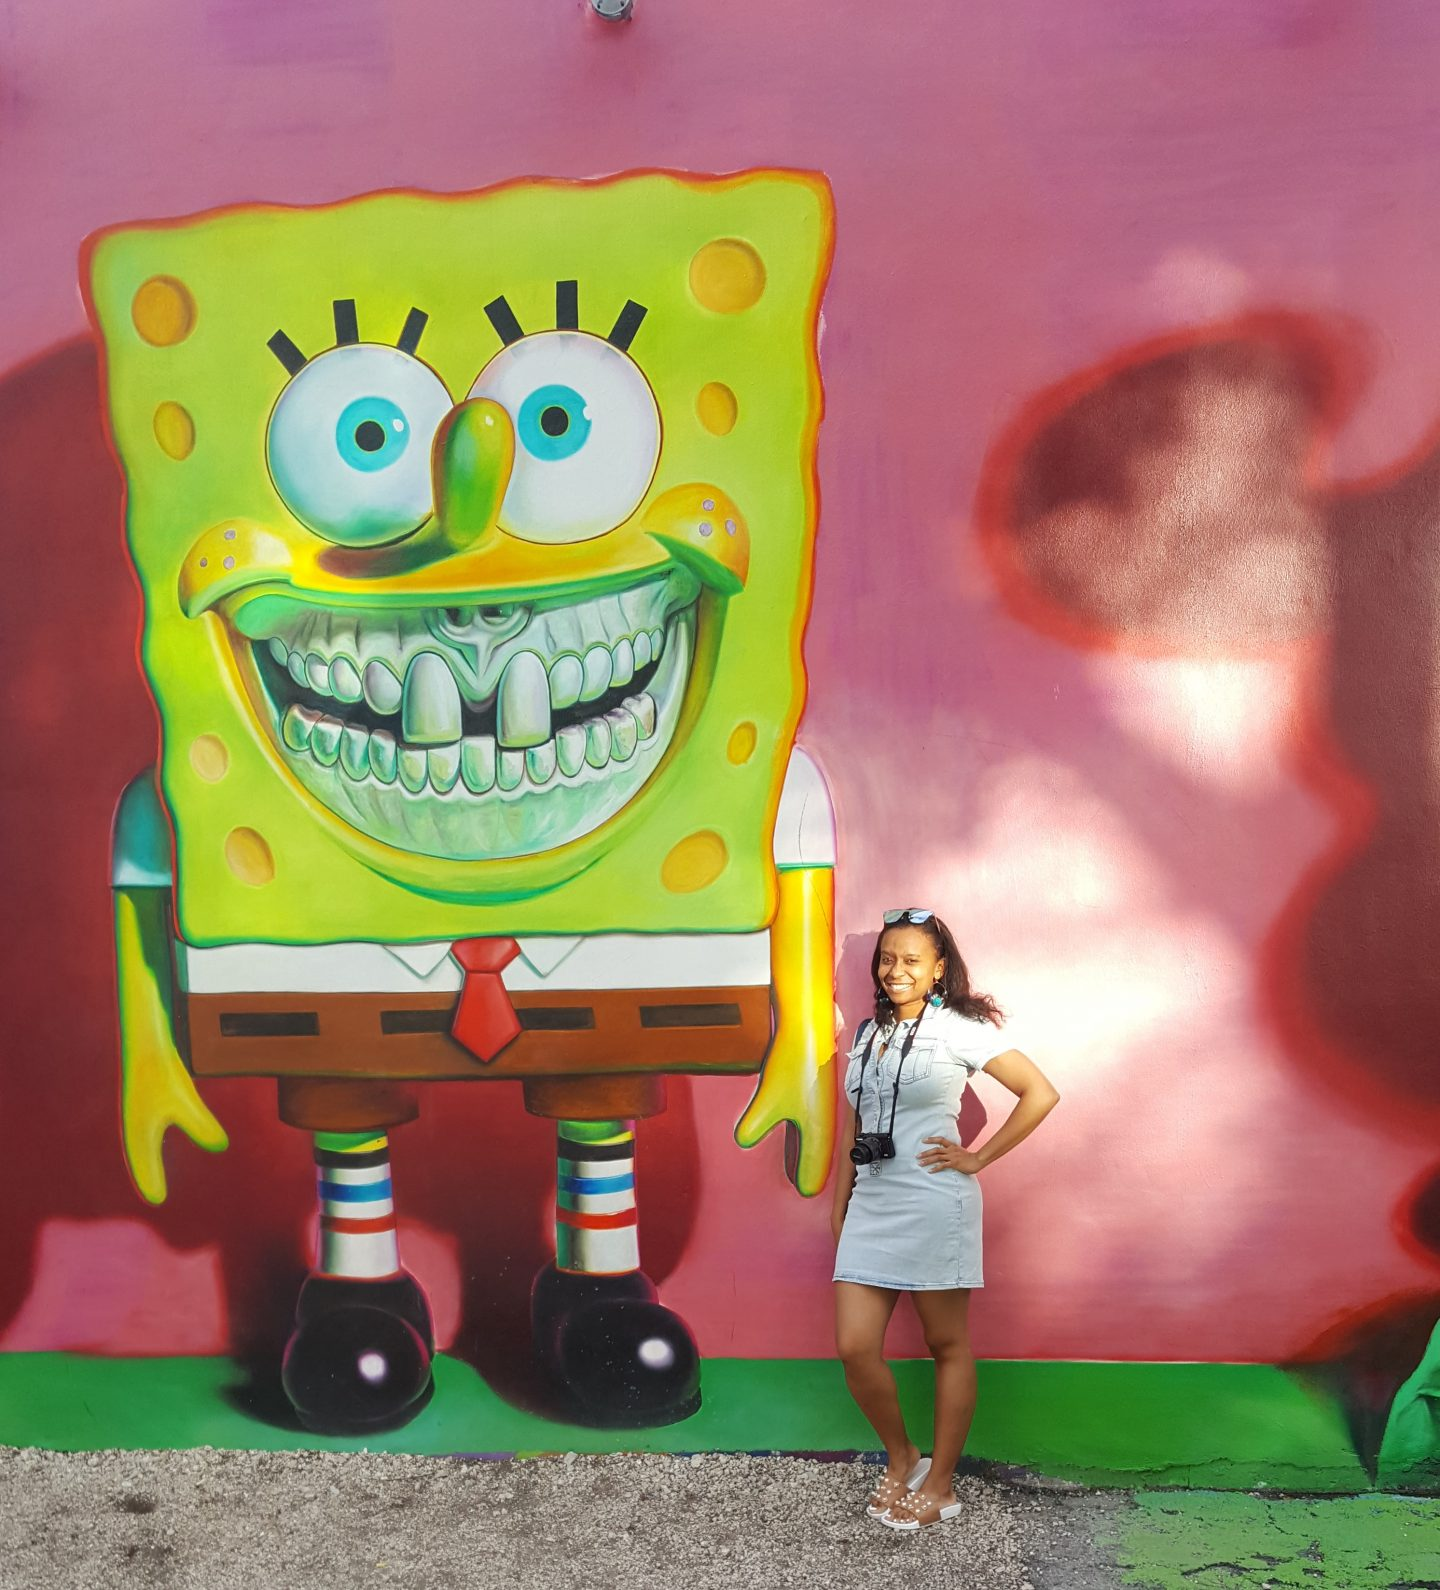 Wynwood Walls, Wynwood Walls Miami, Miami Art, Miami visuals, Miami murals, Miami US, girl at Wynwood Walls, Miami street art, staceessmoothie, stacee's smoothie, stacees smoothie, spongebob, sponge bob, spongebob square pants, sponge bob square pants, nickelodeon, cartoon